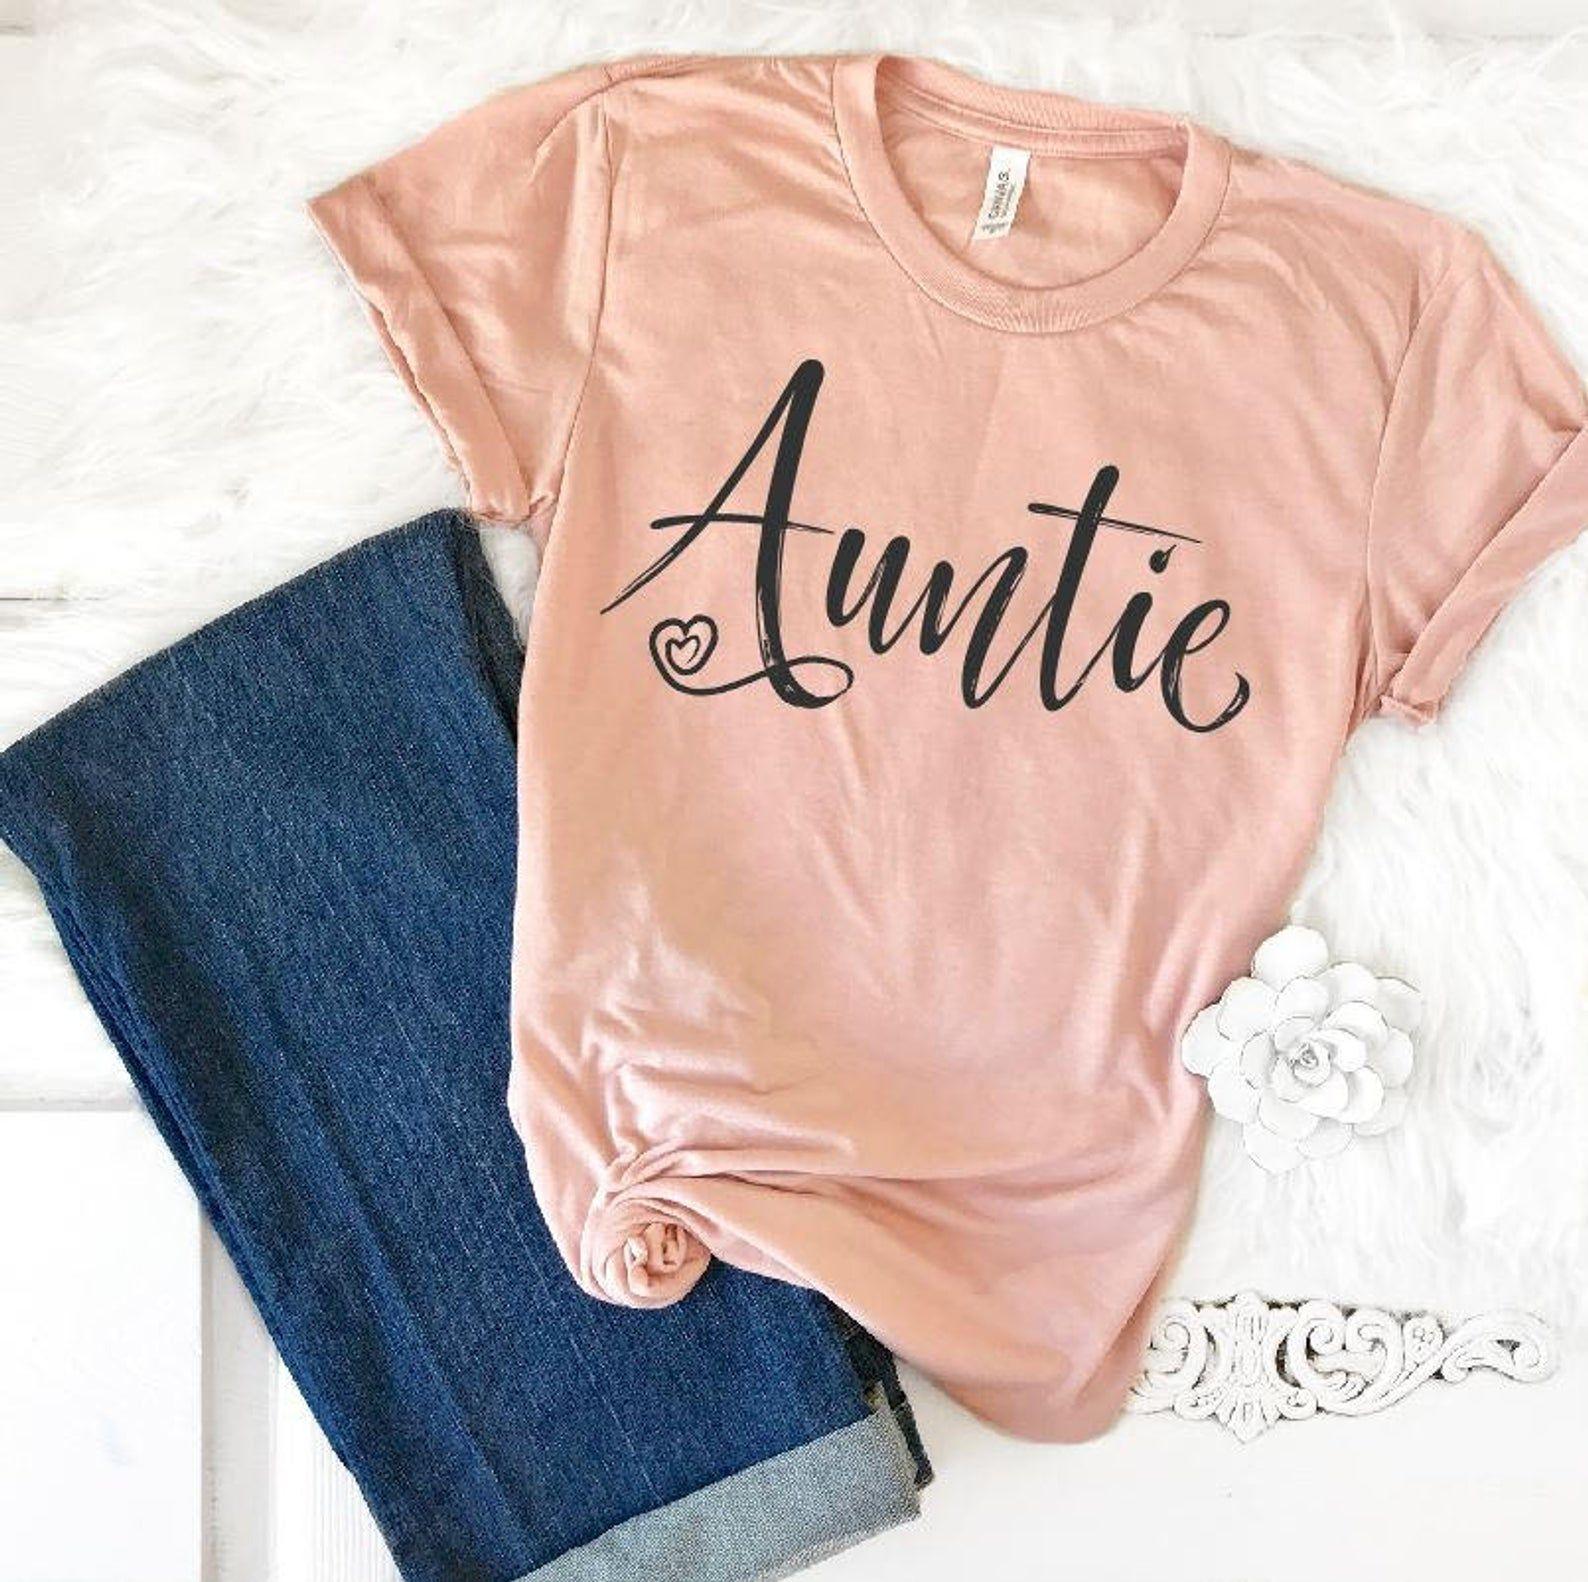 Auntie Shirt, Aunt Shirt, Auntie Gift, Aunt Pregnancy Announcement TShirt, Baby Reveal, Aunt Gift, New Aunt Shirt, Auntie TShirt, Aunt Tee